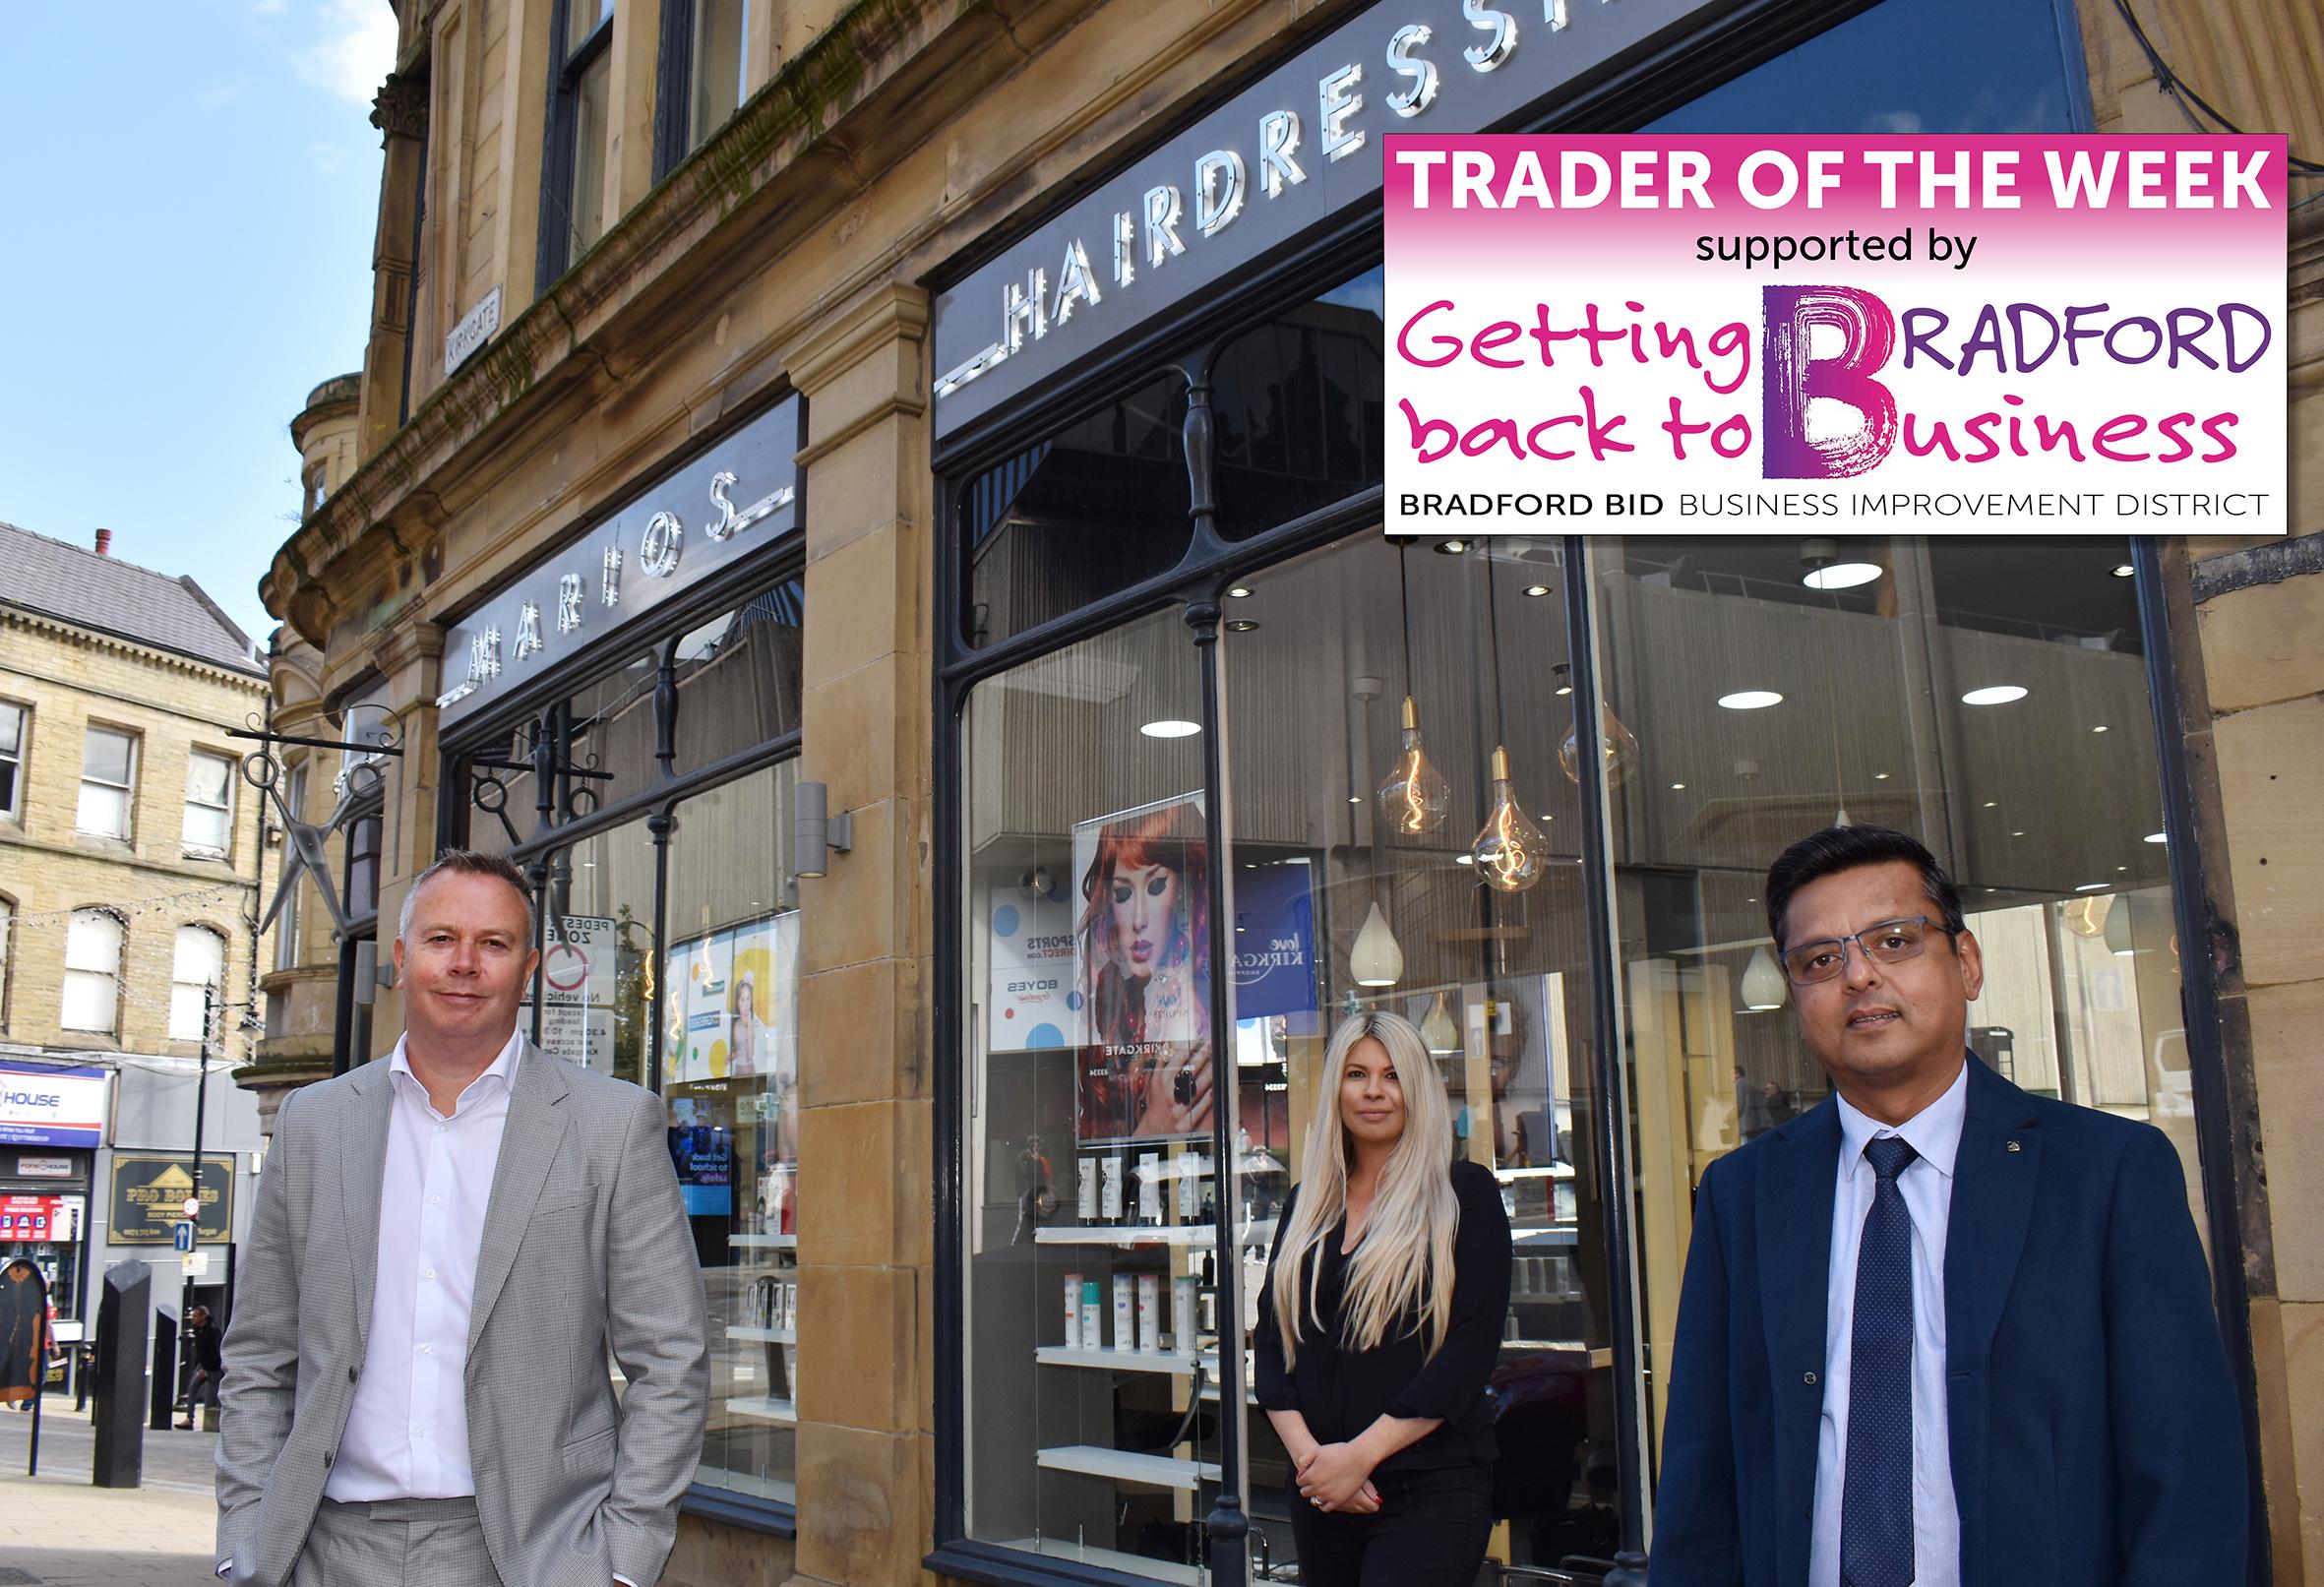 Marios still cutting it after 70 years in Bradford